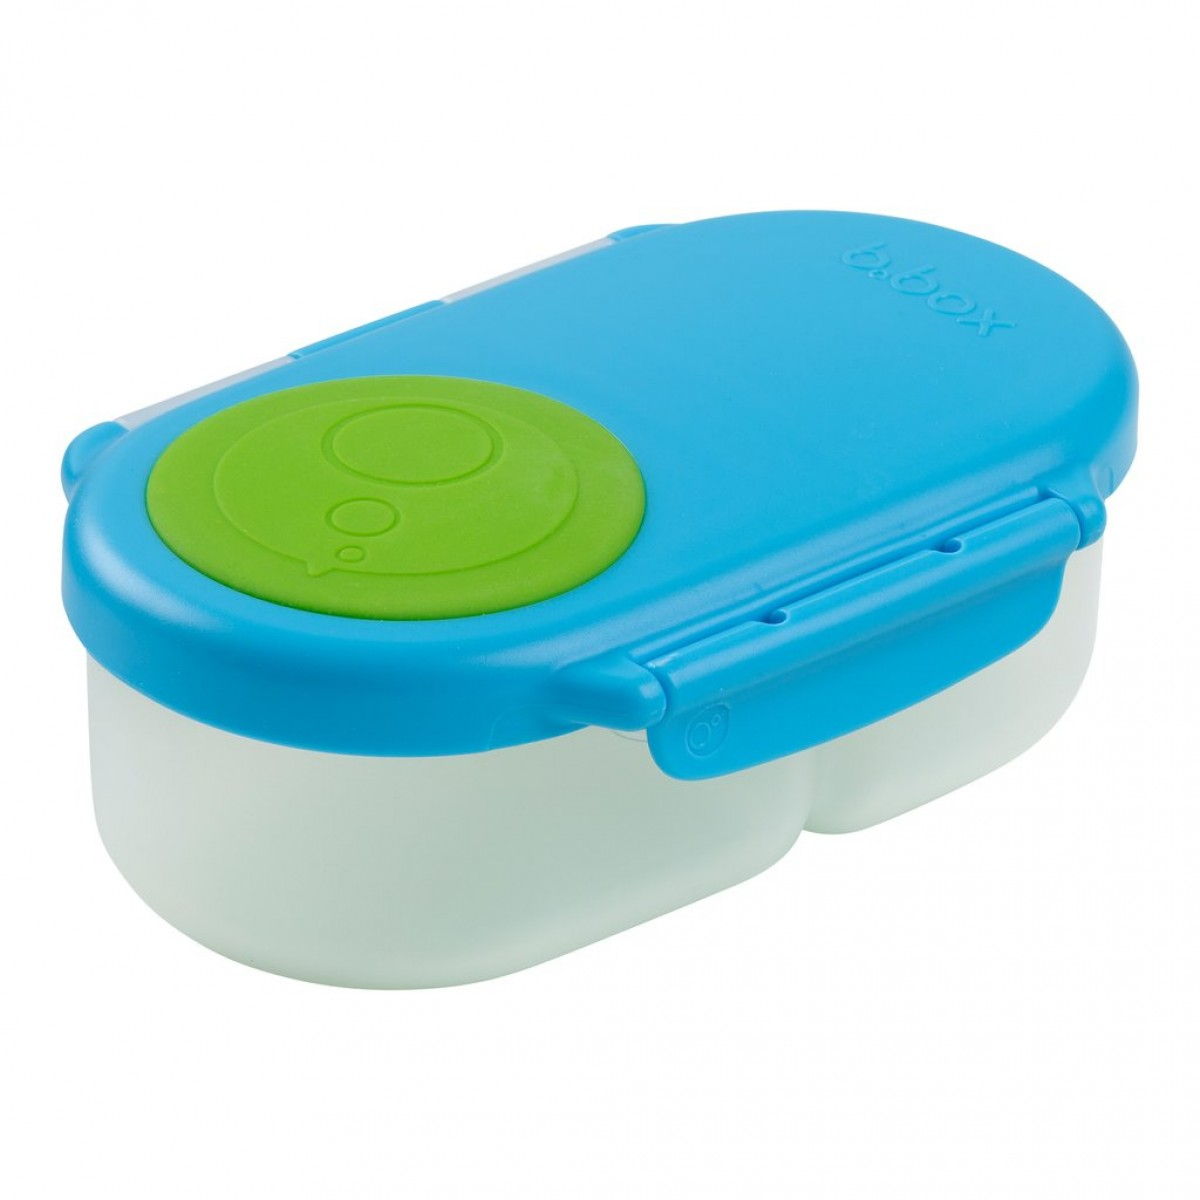 Snack Box Ocean Breeze Blue Green